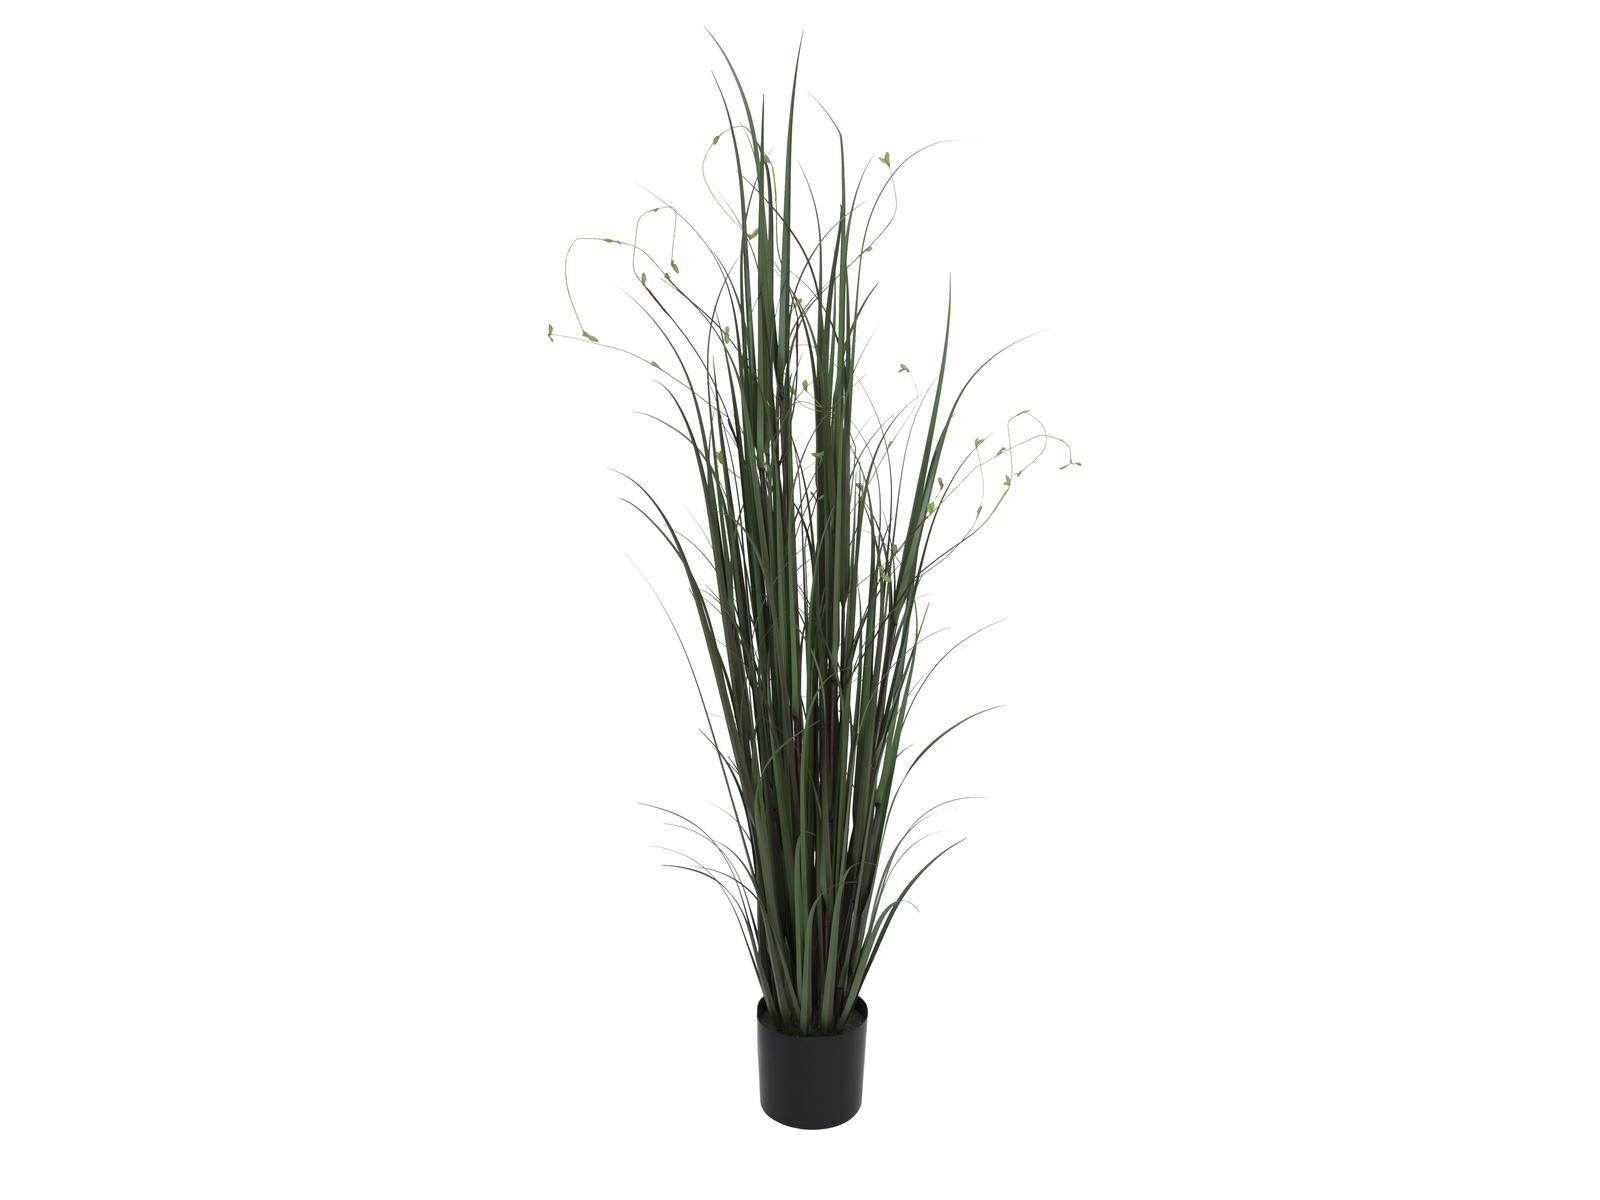 Willow branch grass, 183 cm